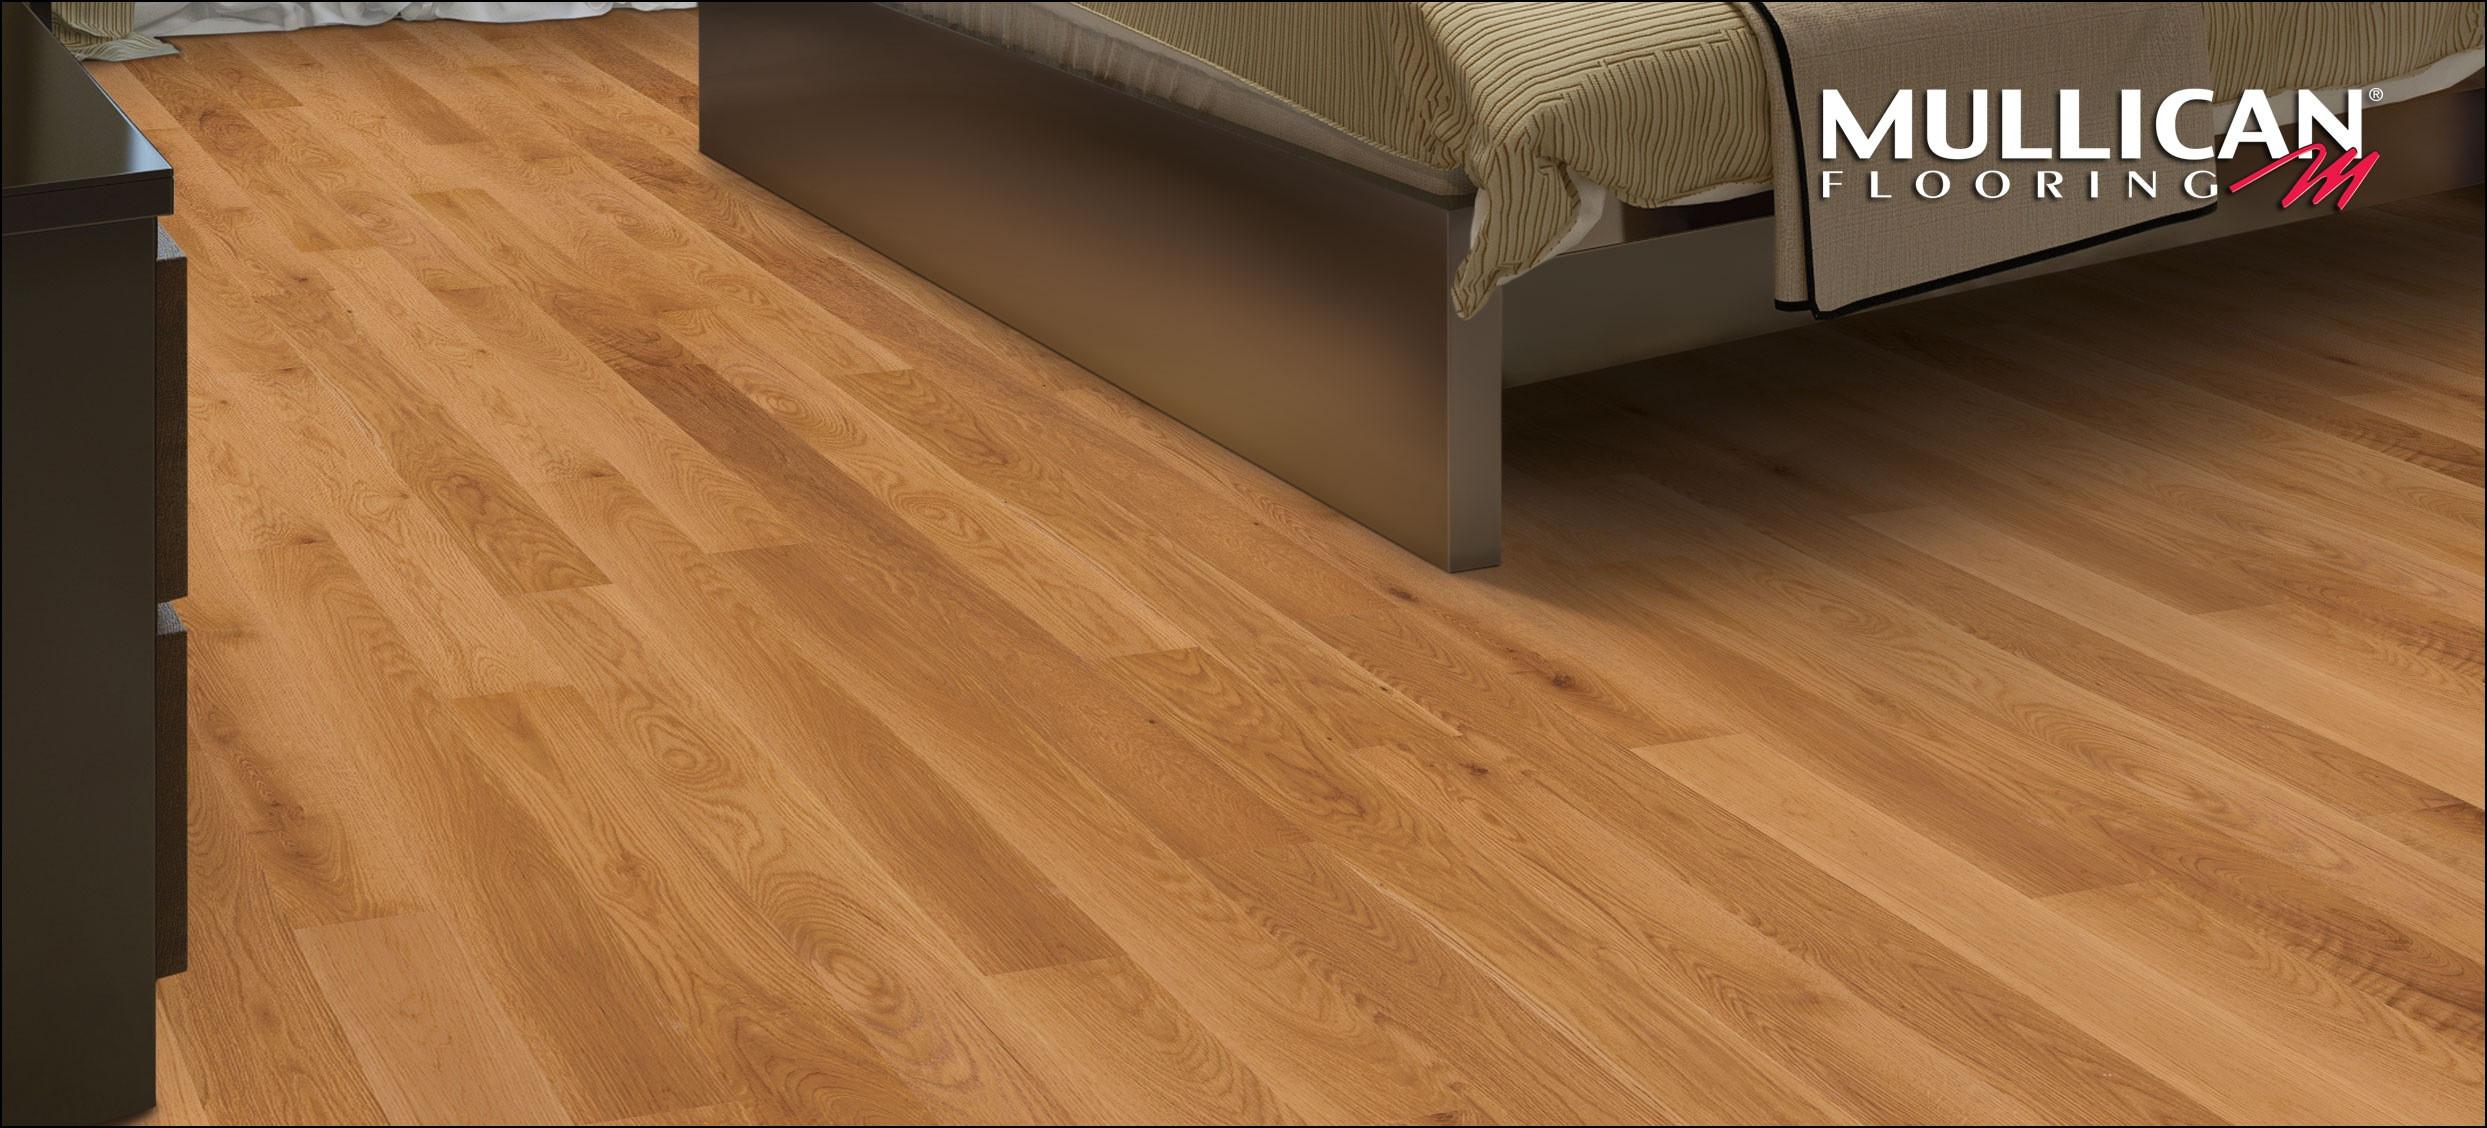 bruce 5 16 hardwood flooring of hardwood flooring suppliers france flooring ideas intended for hardwood flooring installation san diego collection mullican flooring home of hardwood flooring installation san diego